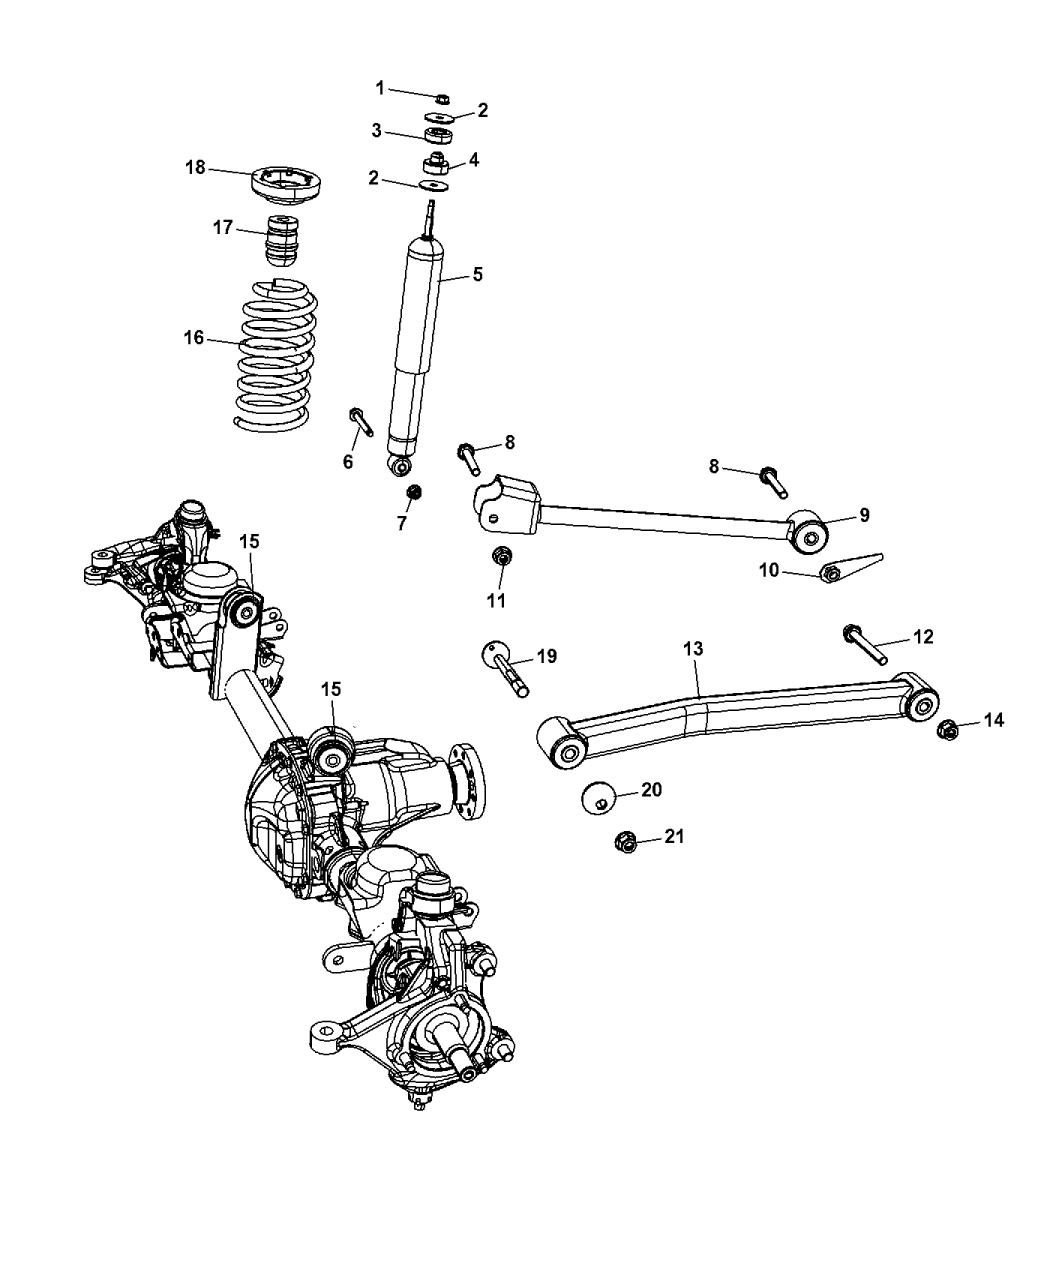 2016 Jeep Wrangler Suspension Front Springs Shocks Control Arms Diagram